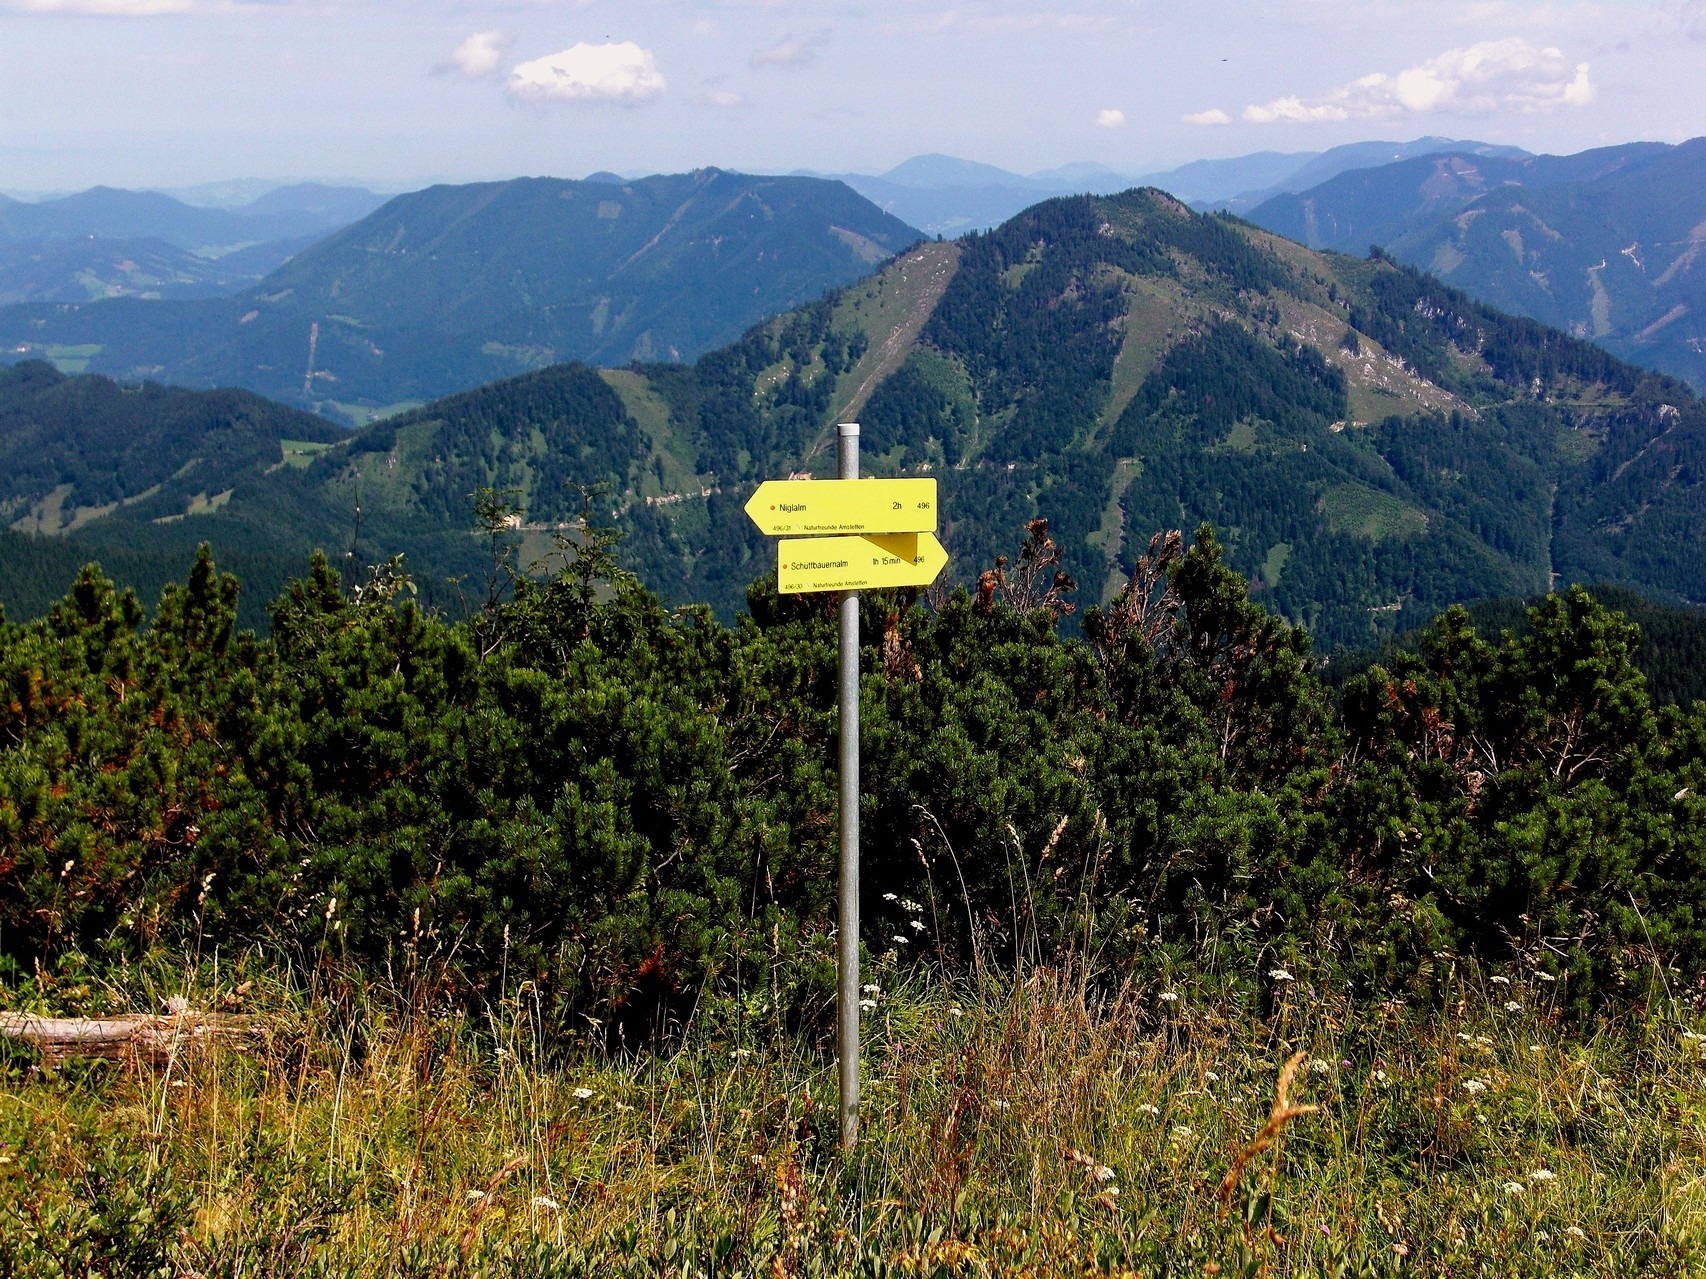 Wegweiser am Gipfel der Bodenwies